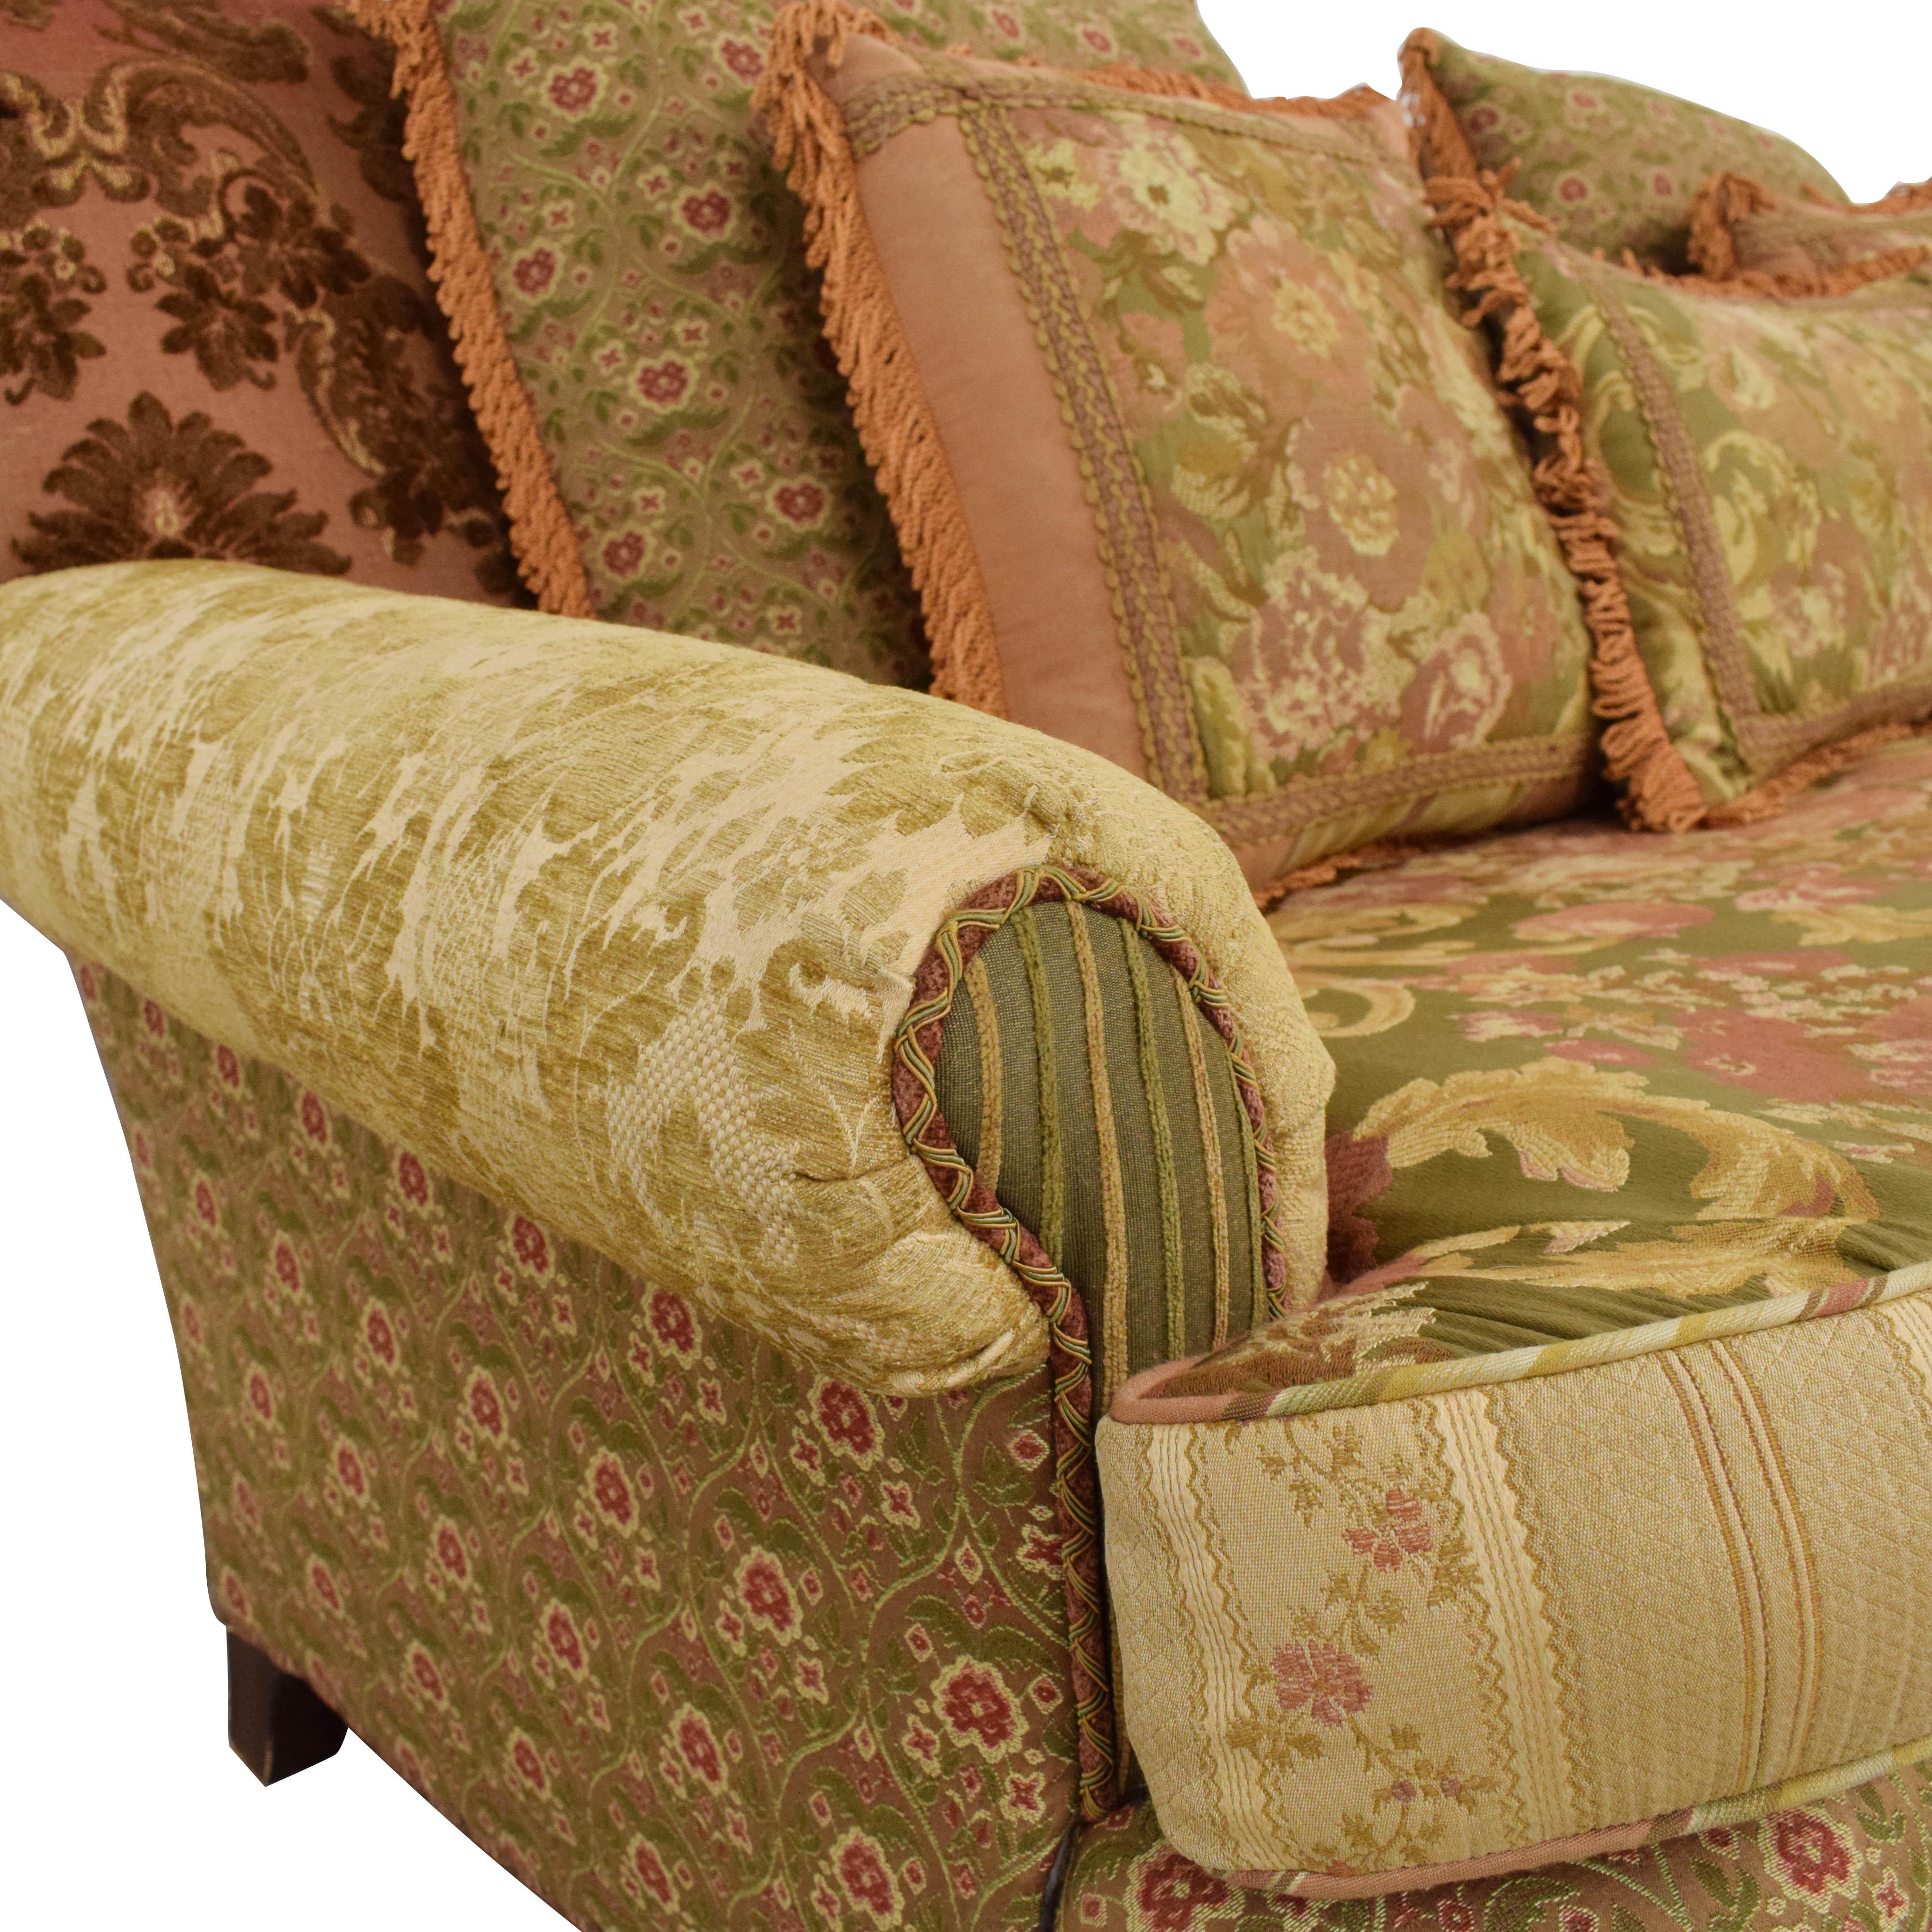 Key City Furniture Key City Jeff Zimmerman Victorian Sofa ct